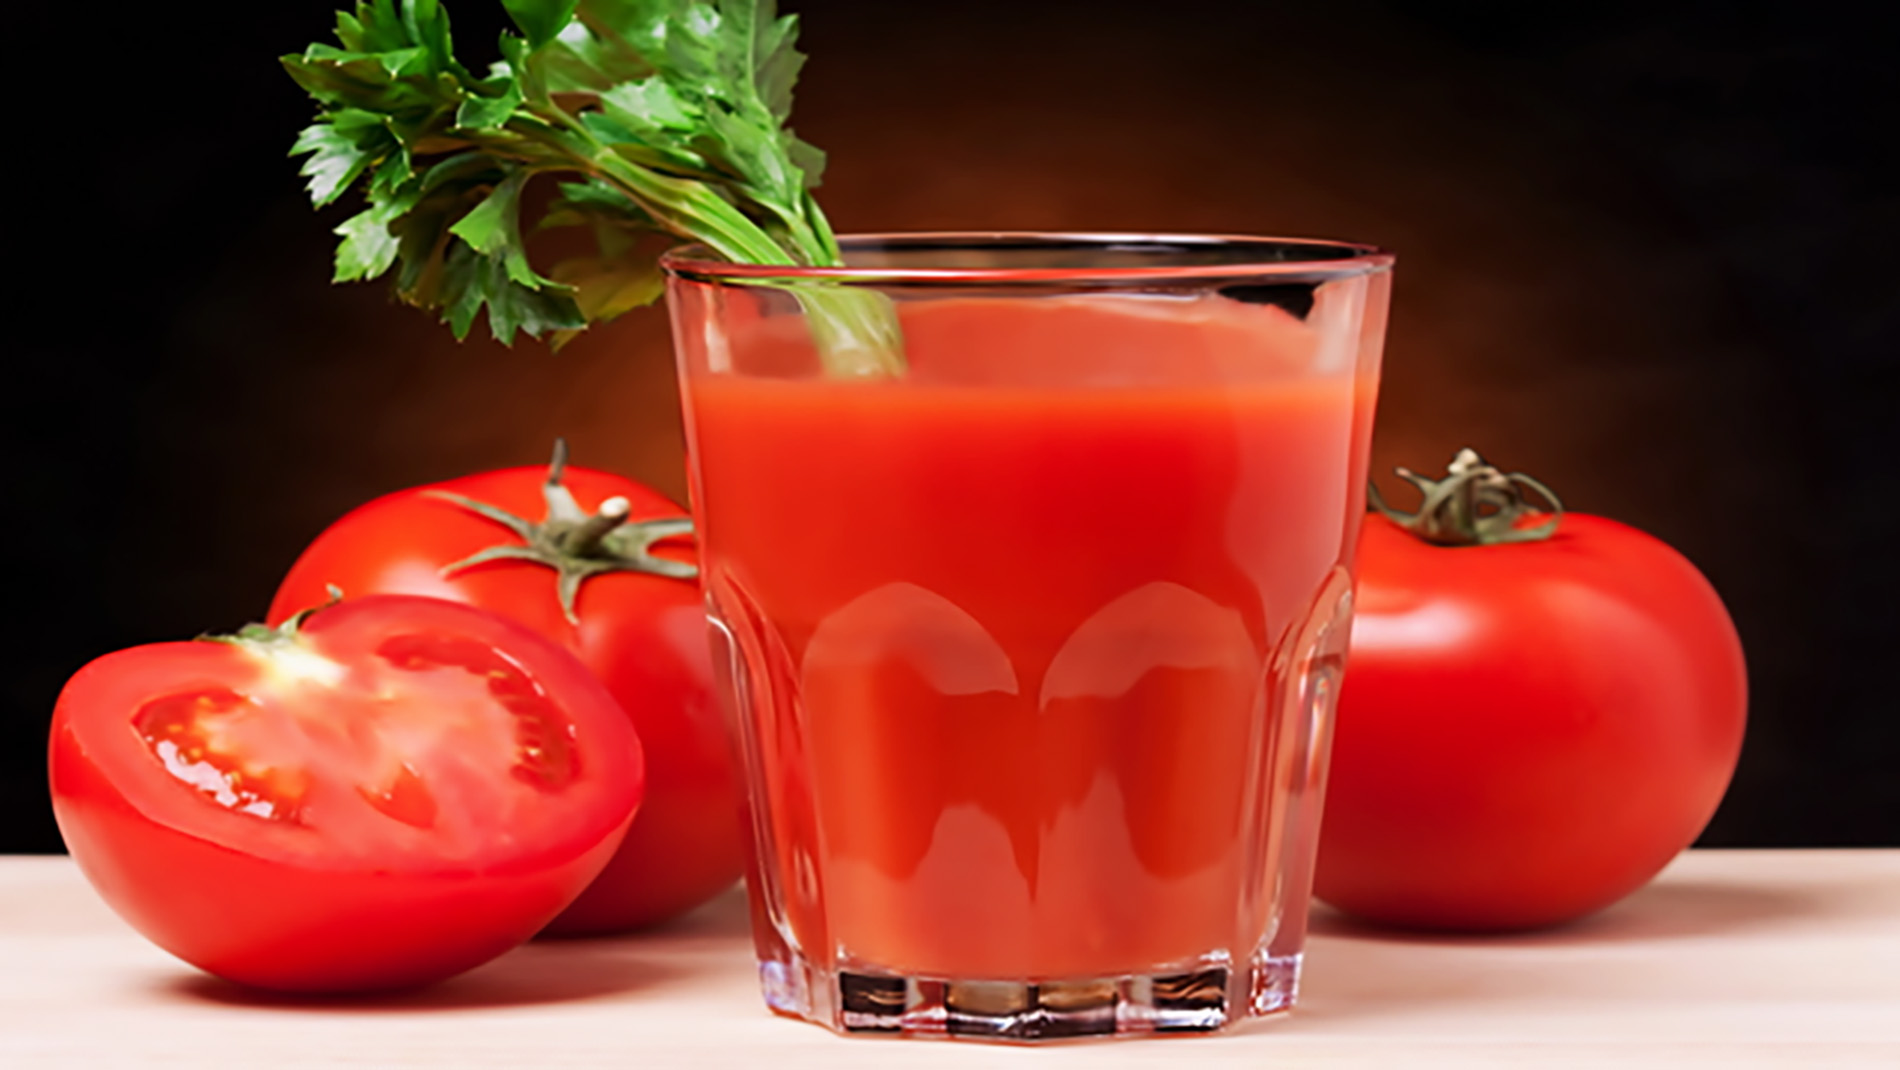 app-suco-de-tomate-detox-para-perder-barriga